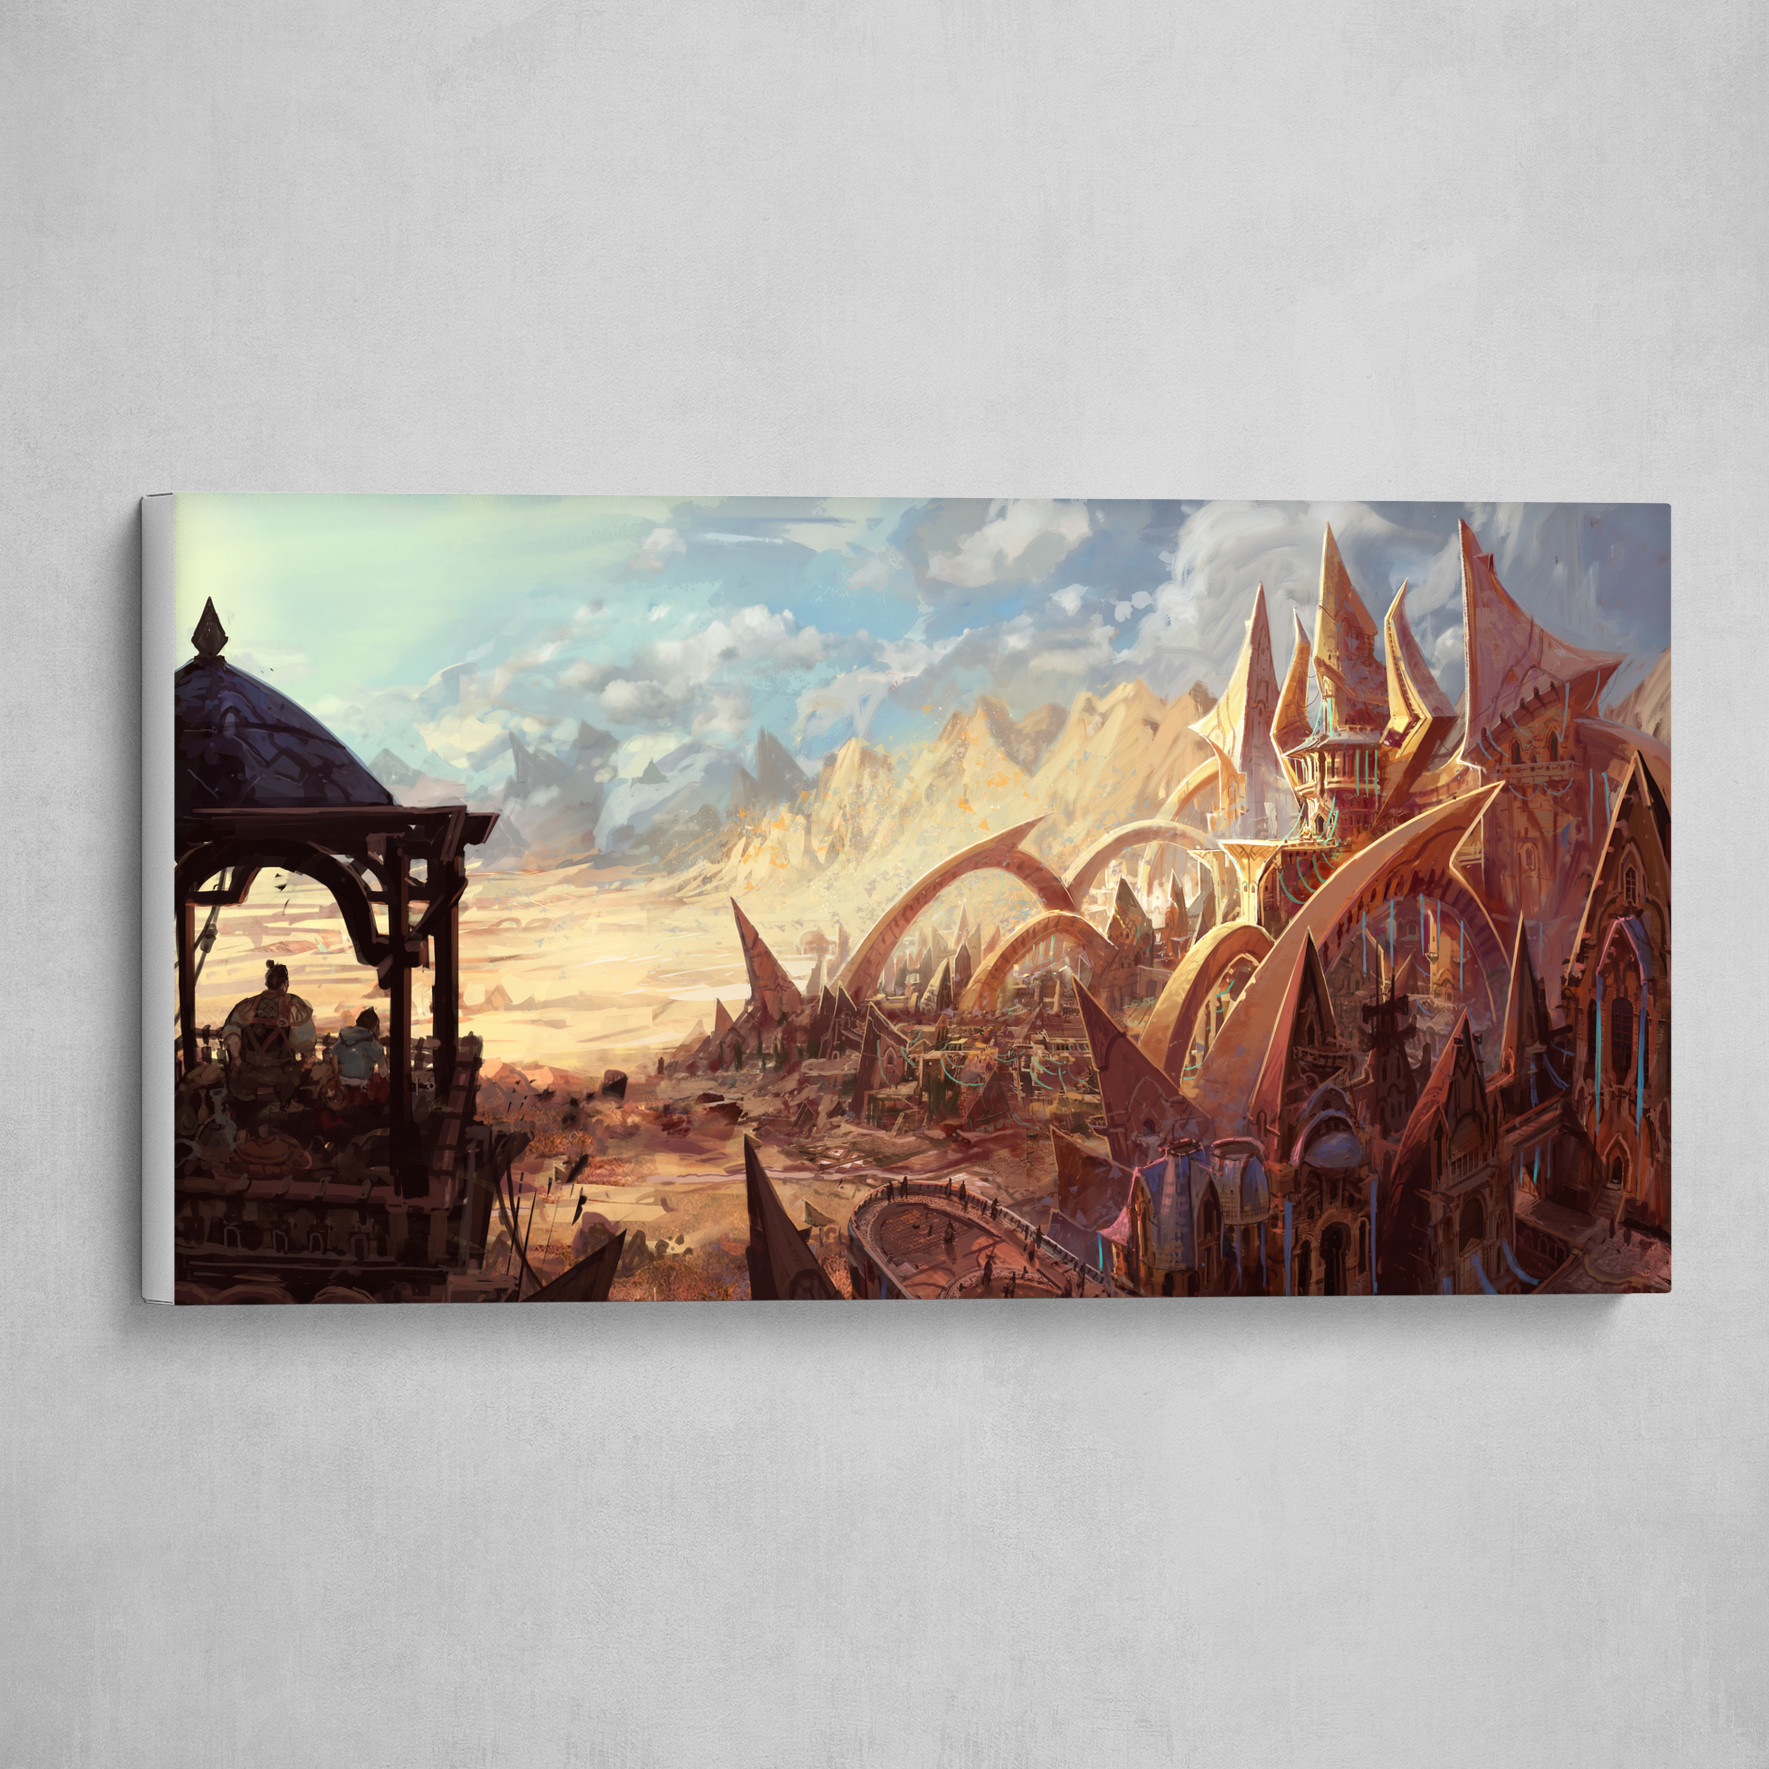 Desert City Sci-Fi